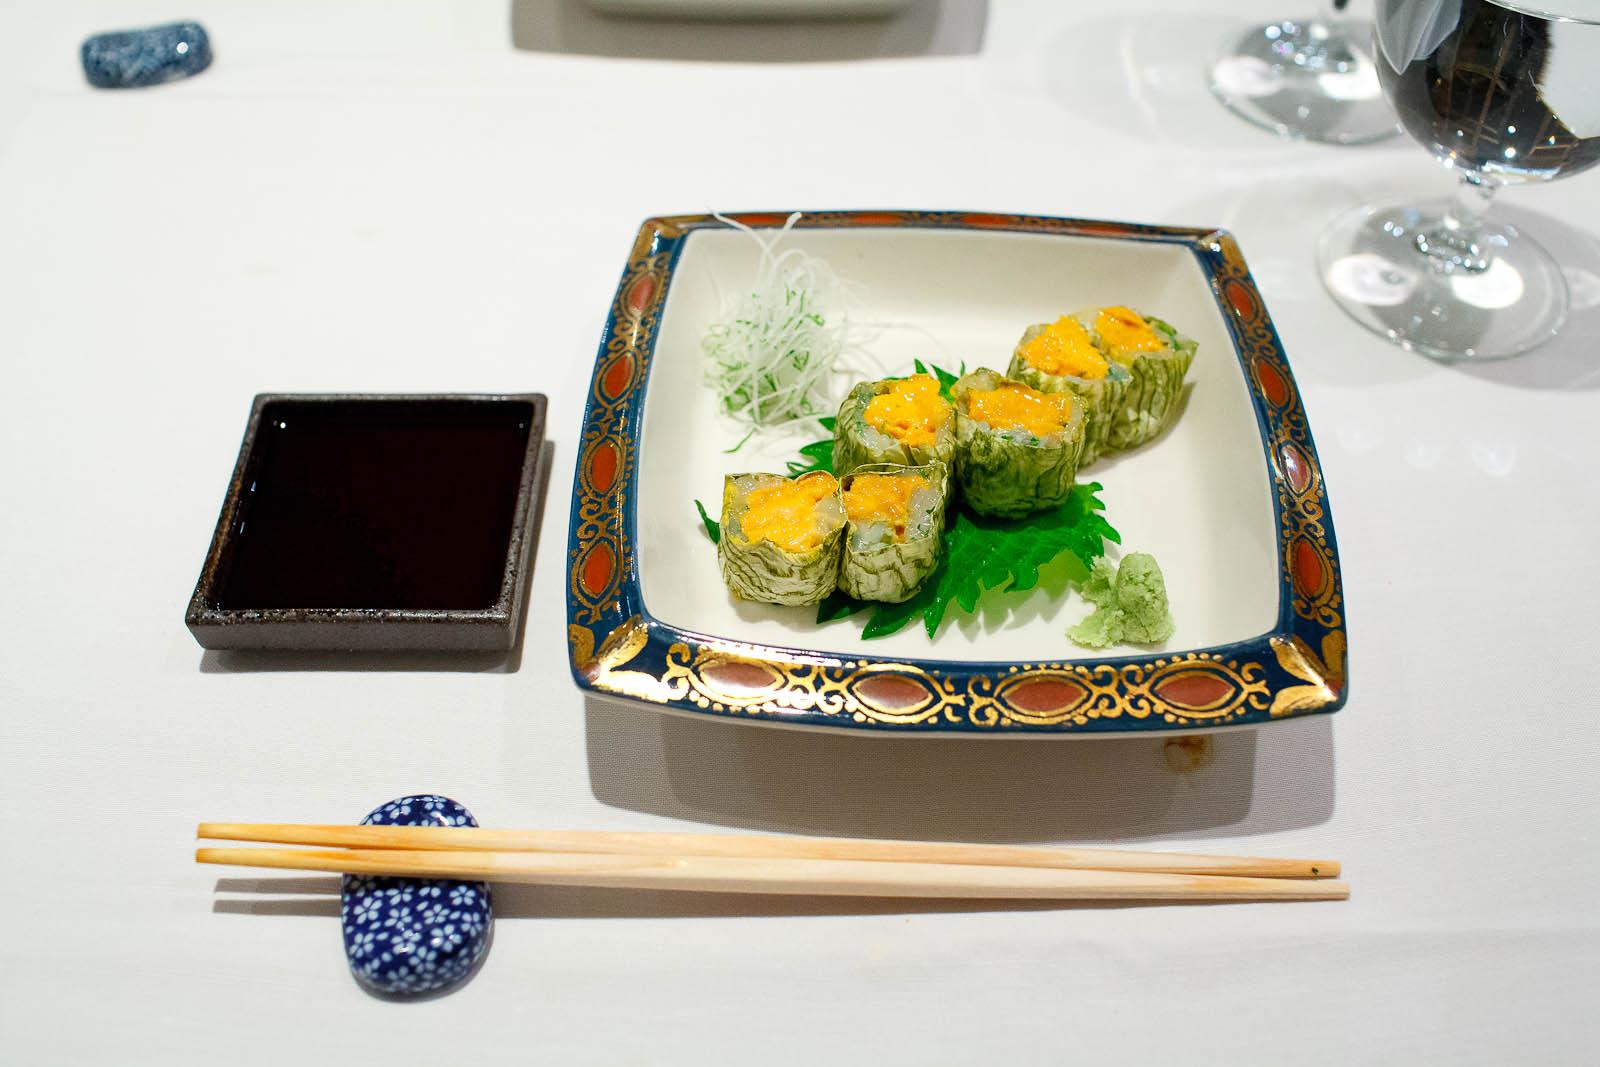 Uni ika kelp - Sea urchin sashimi and shiso squid, rolled in whi